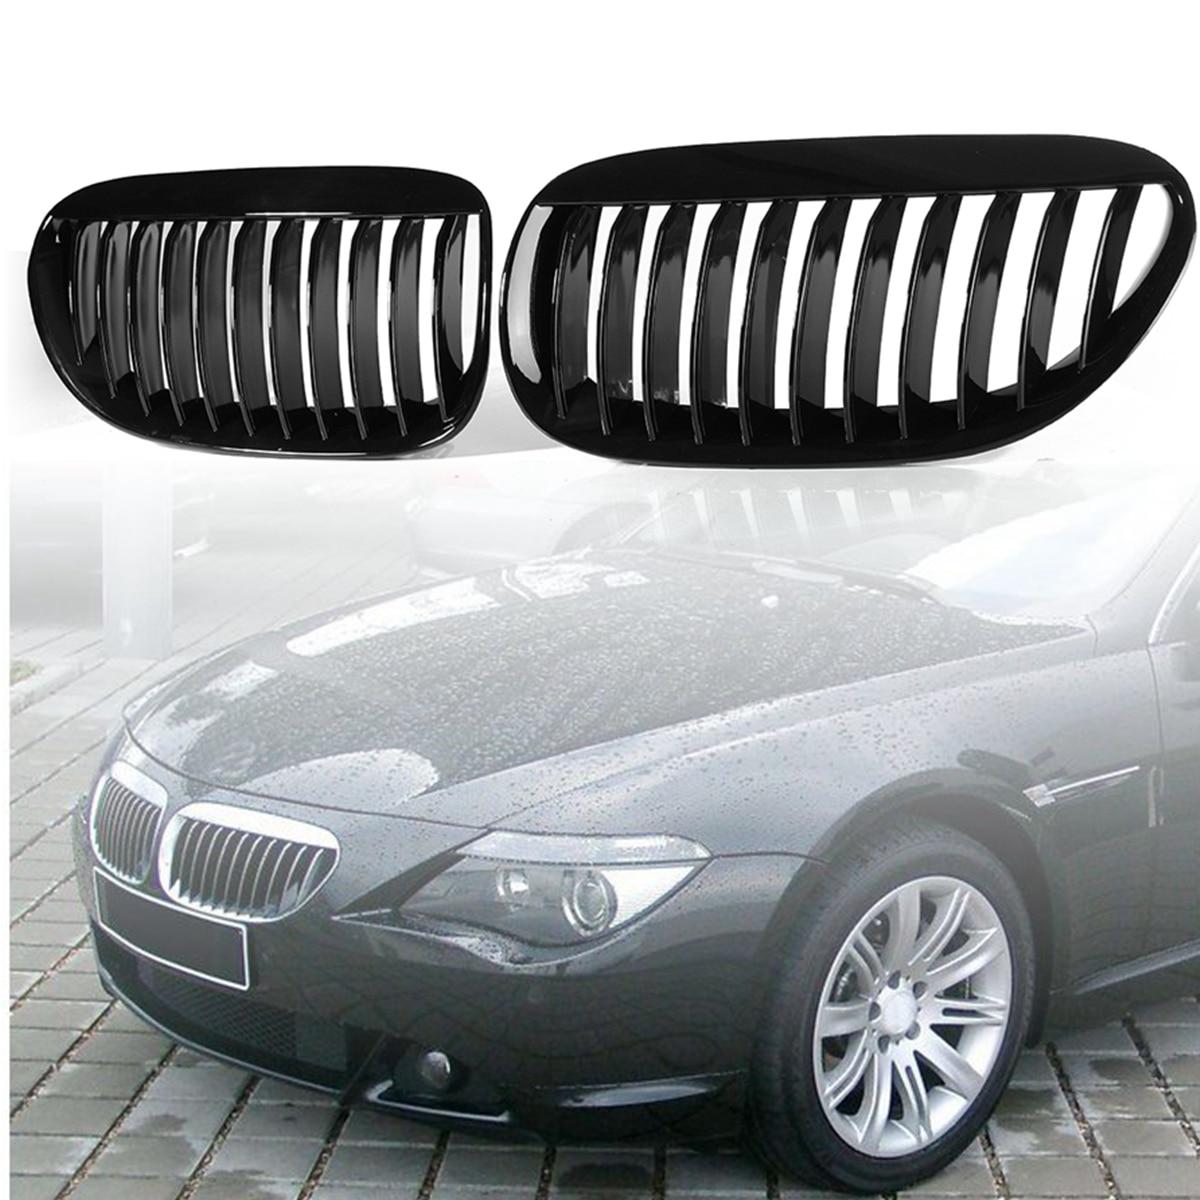 Pair Gloss Black Front Grilles R&L For BMW E63/E64 M6